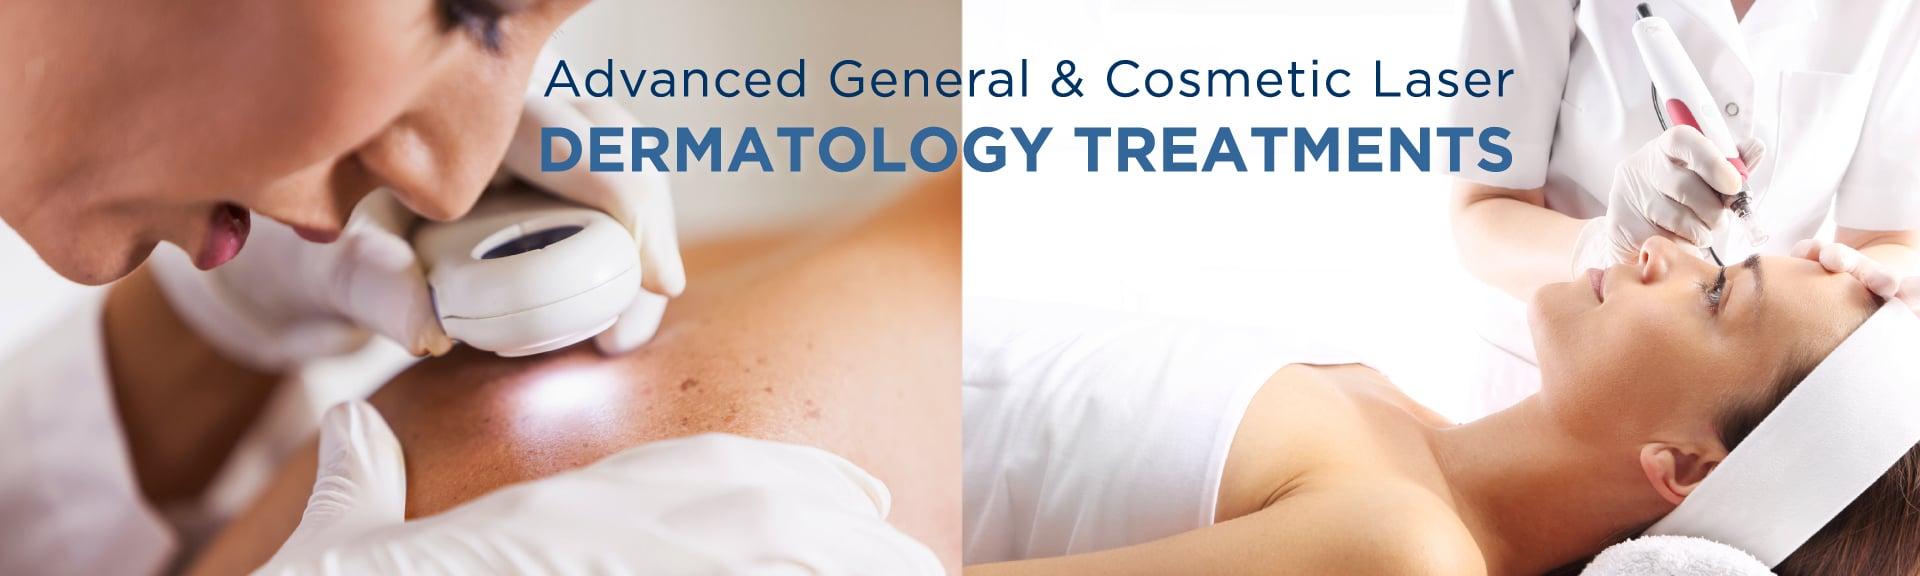 Sydney dermatology services banner